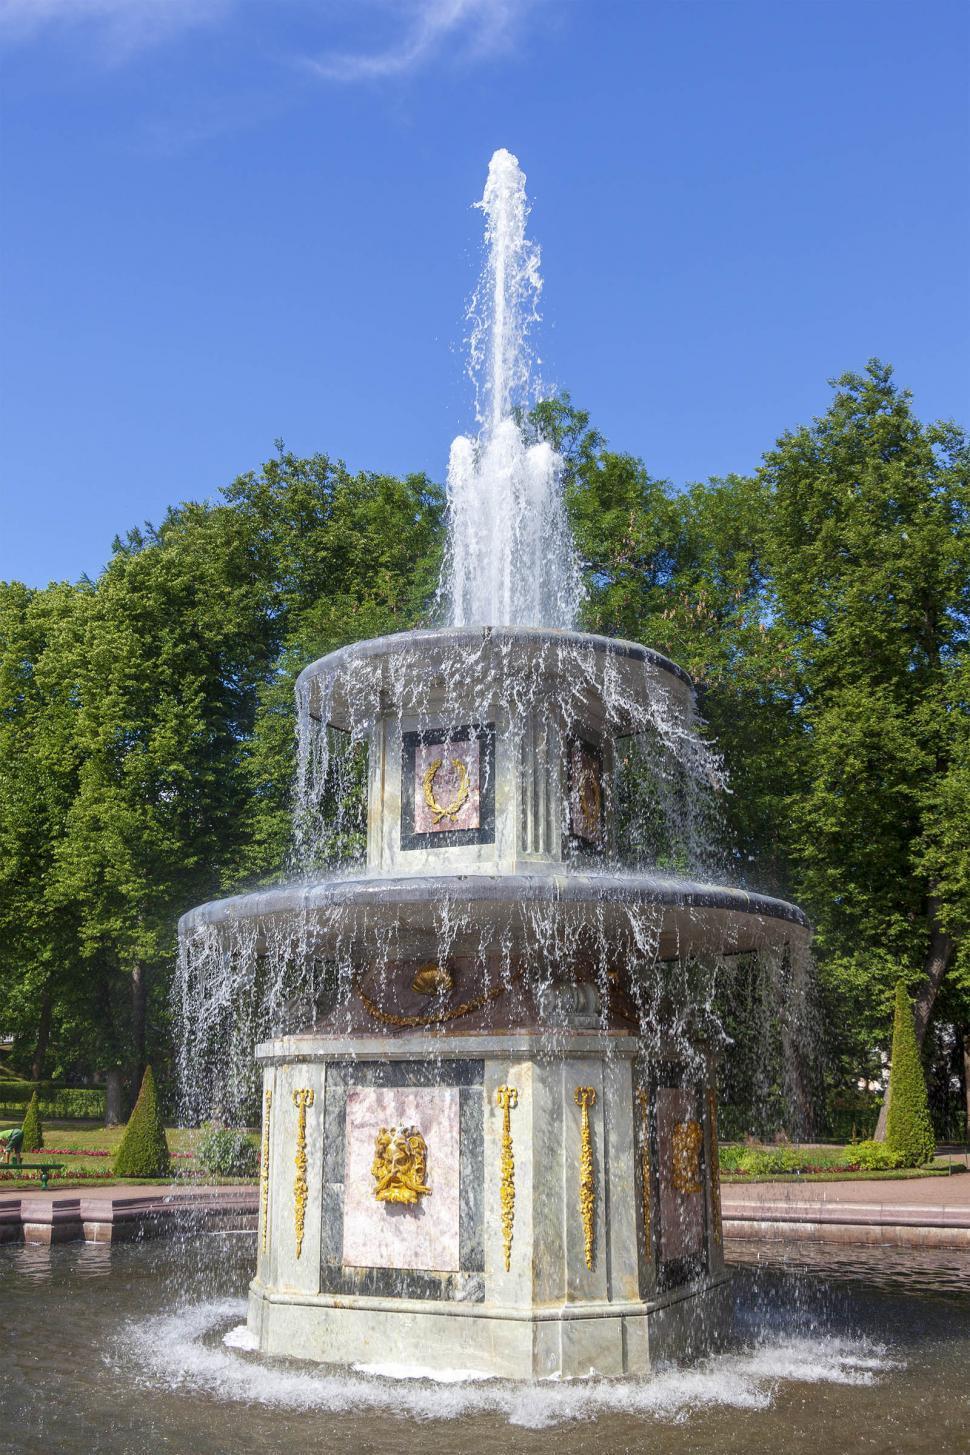 Download Free Stock Photo of Peterhof Palace fountain